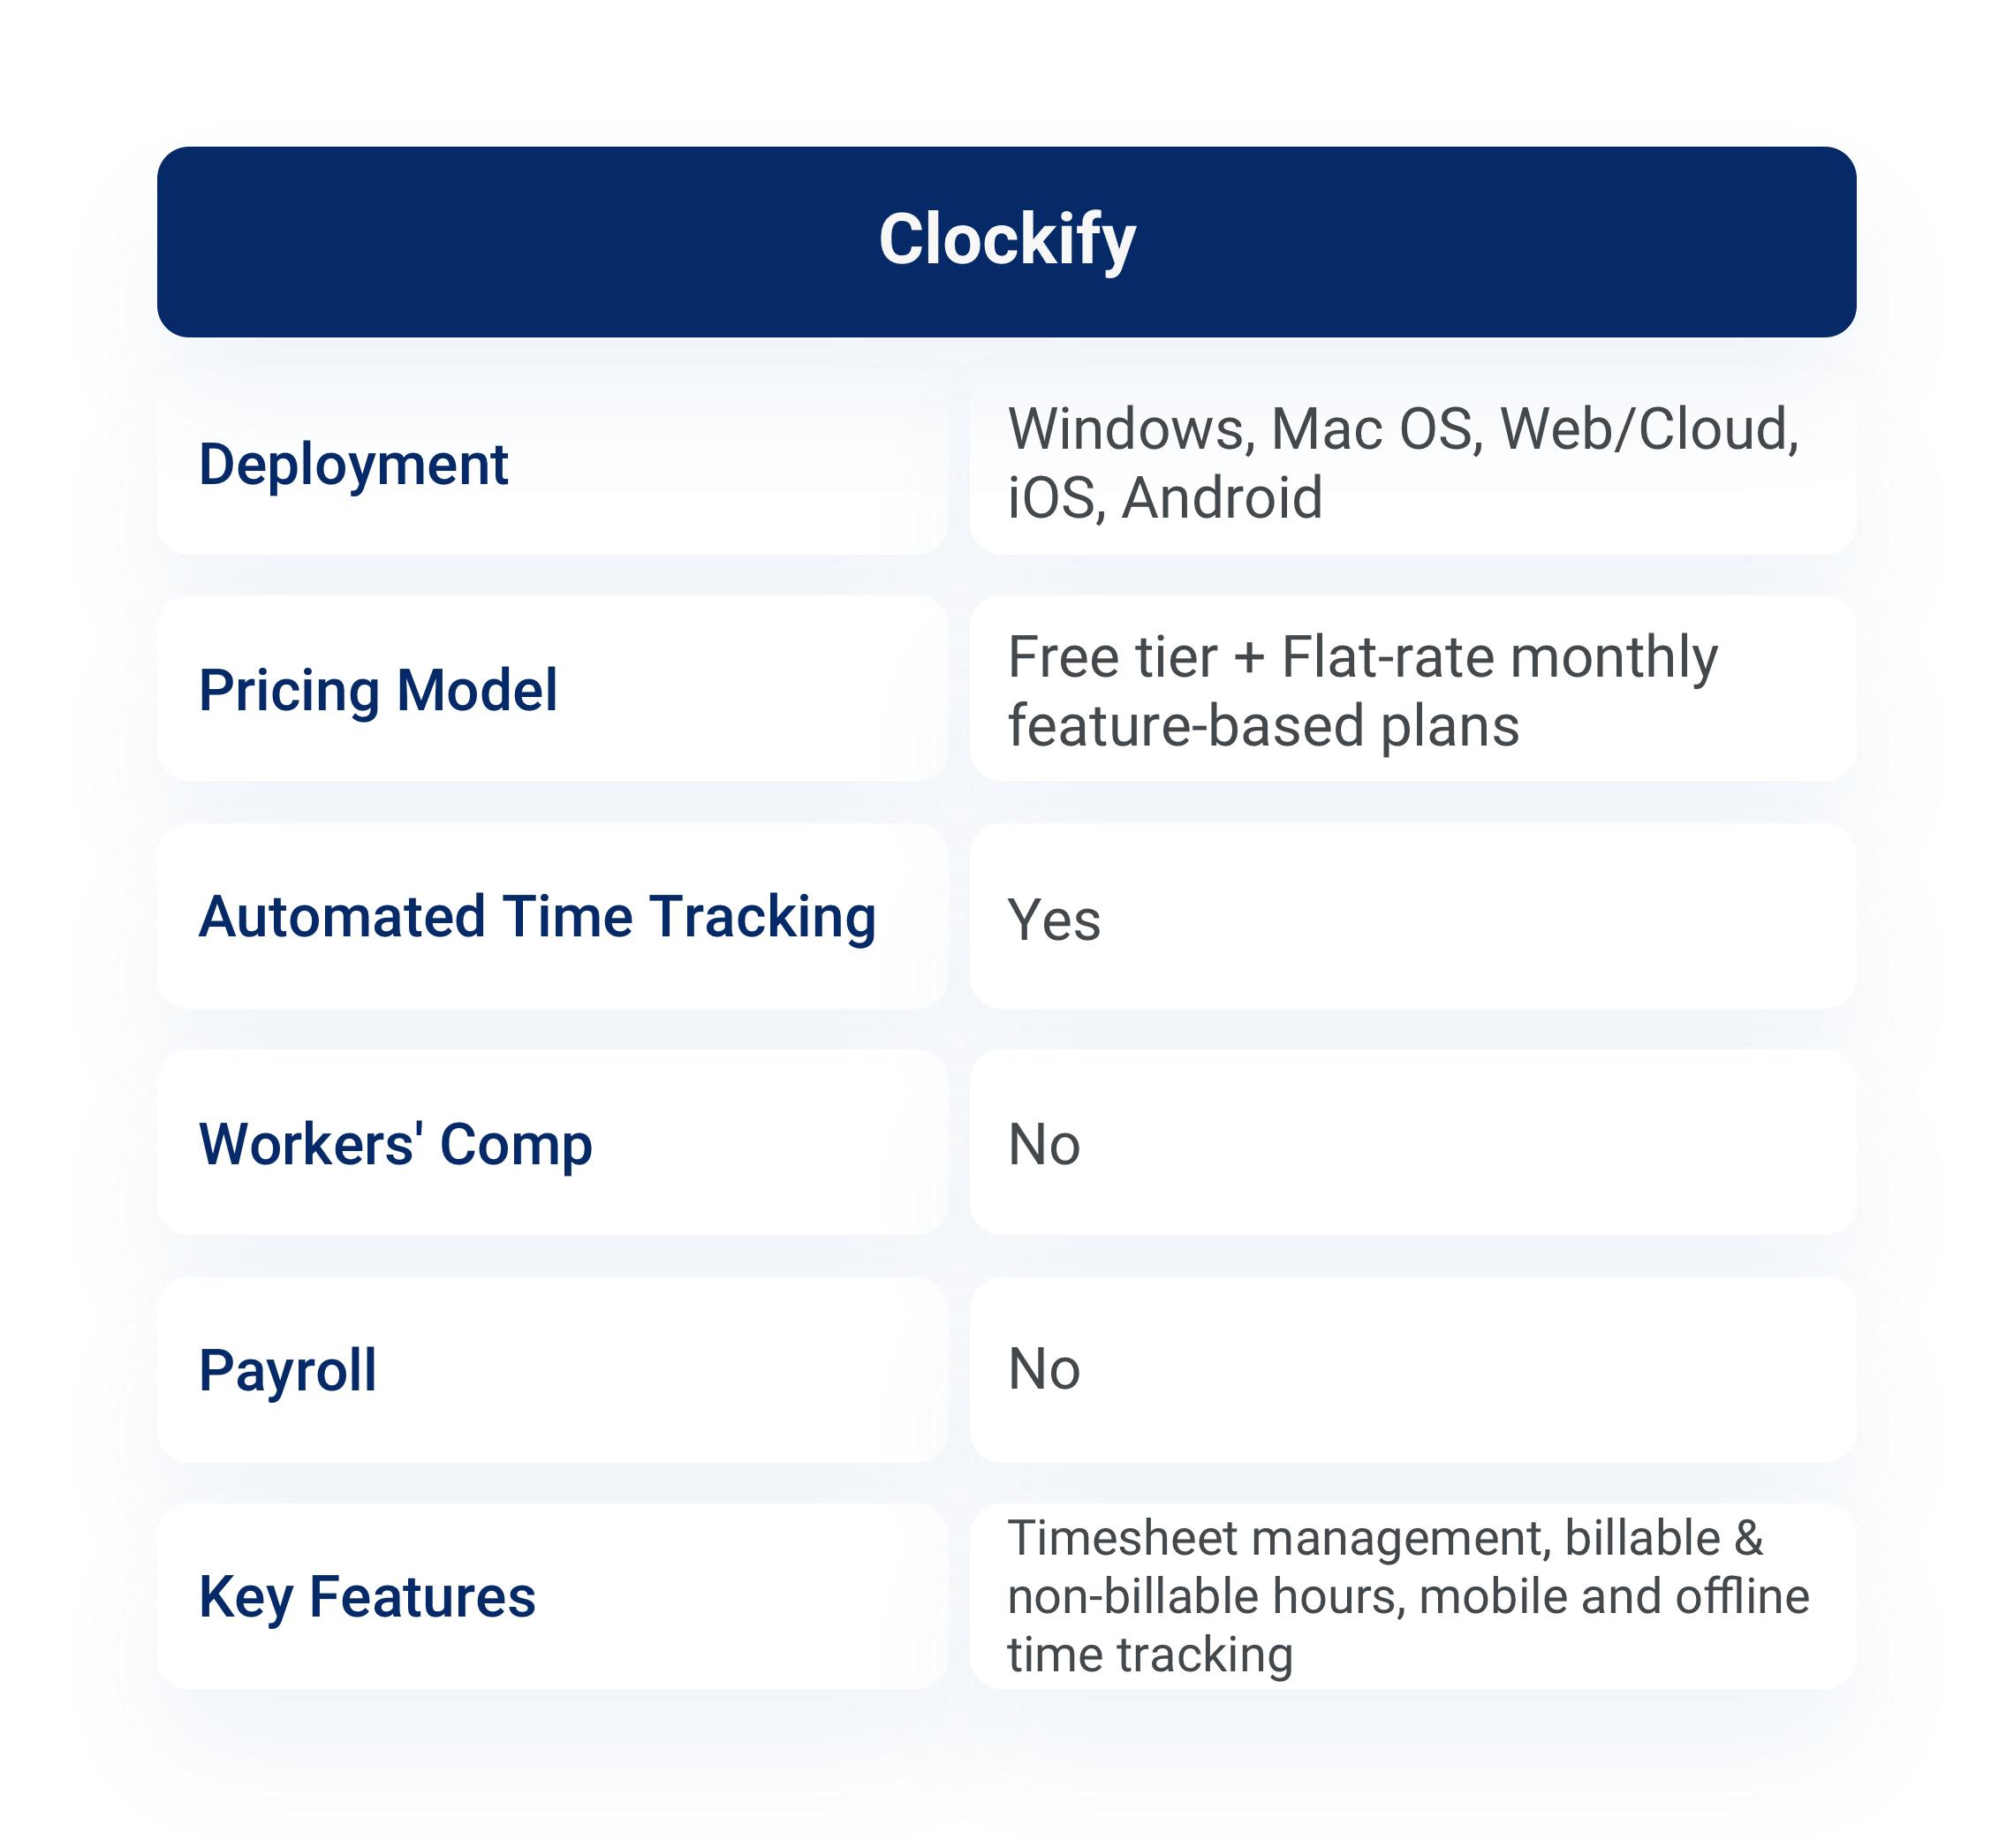 Clockify product description